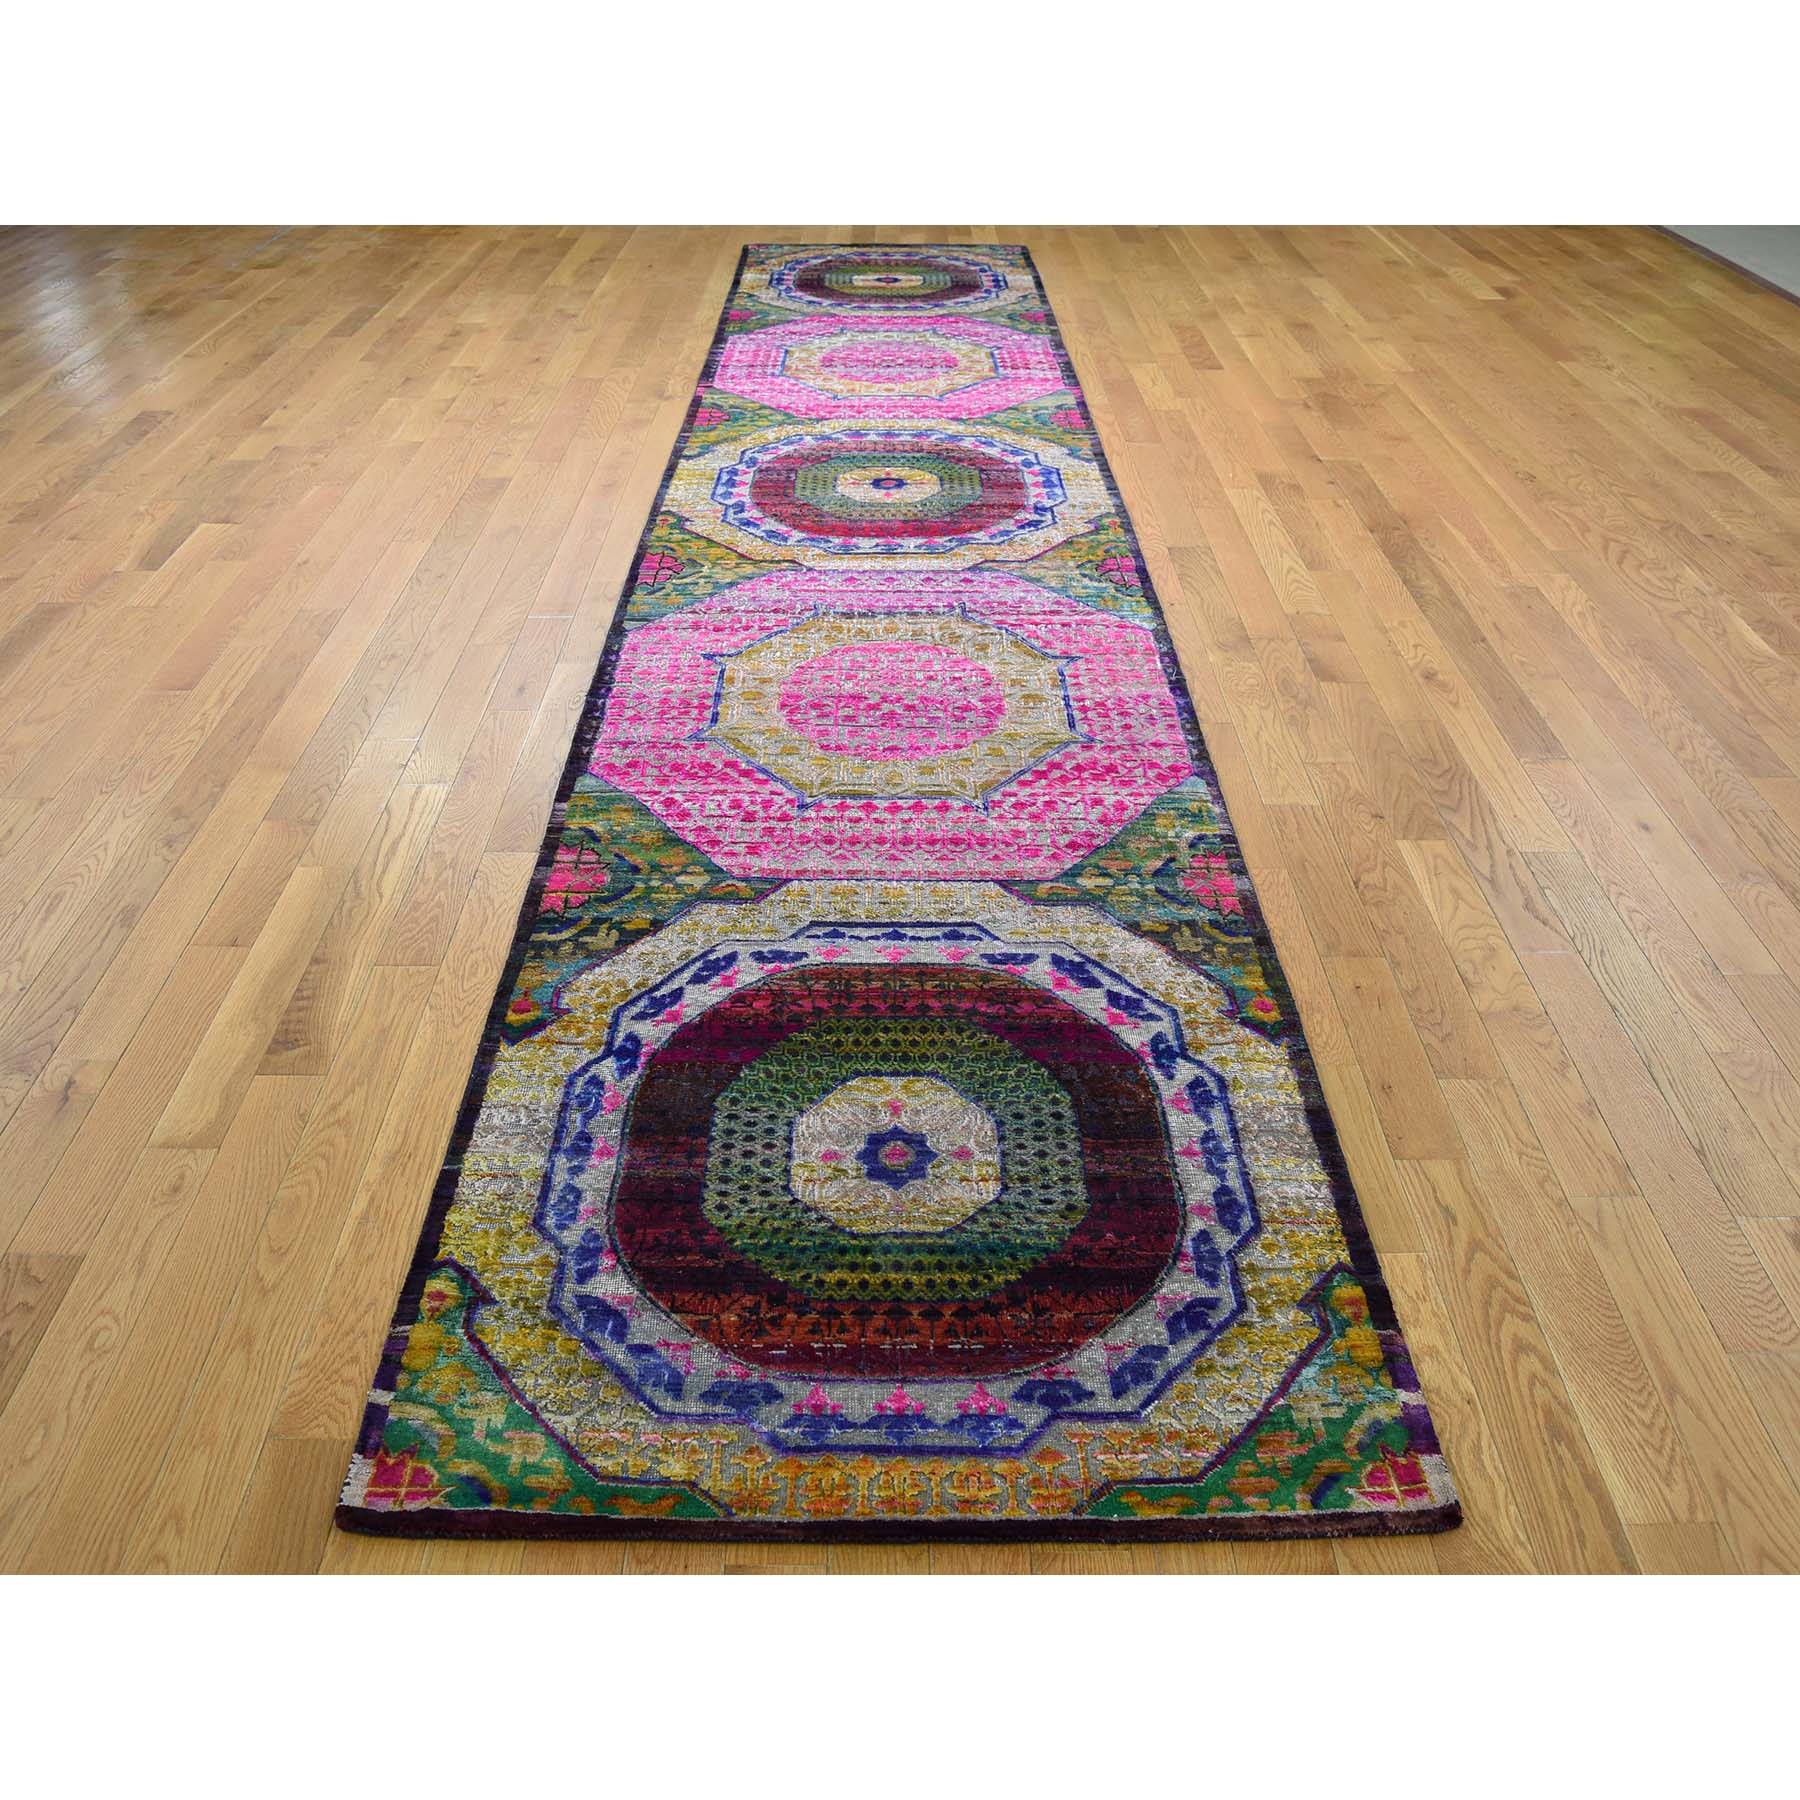 3-1 x15-4  Sari Silk with Oxidized Wool Mamluk Design XL Runner Oriental Rug